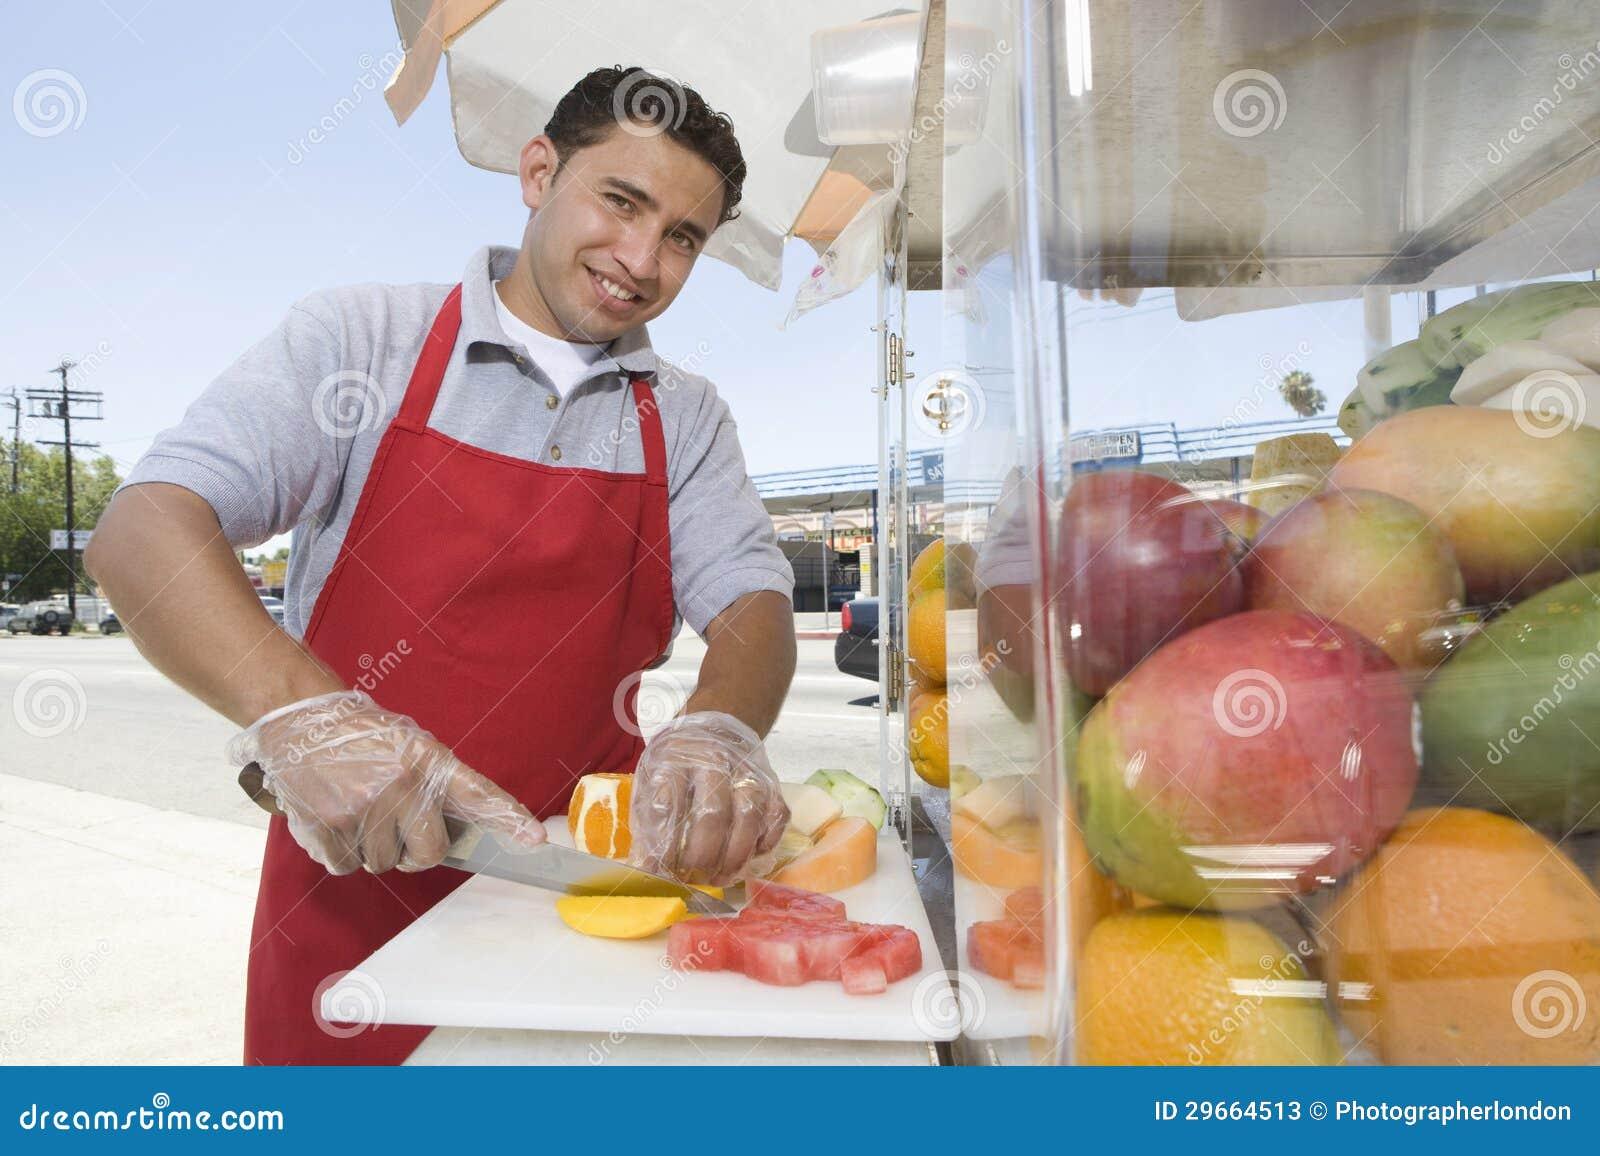 Male Street Vendor Chopping Fruits